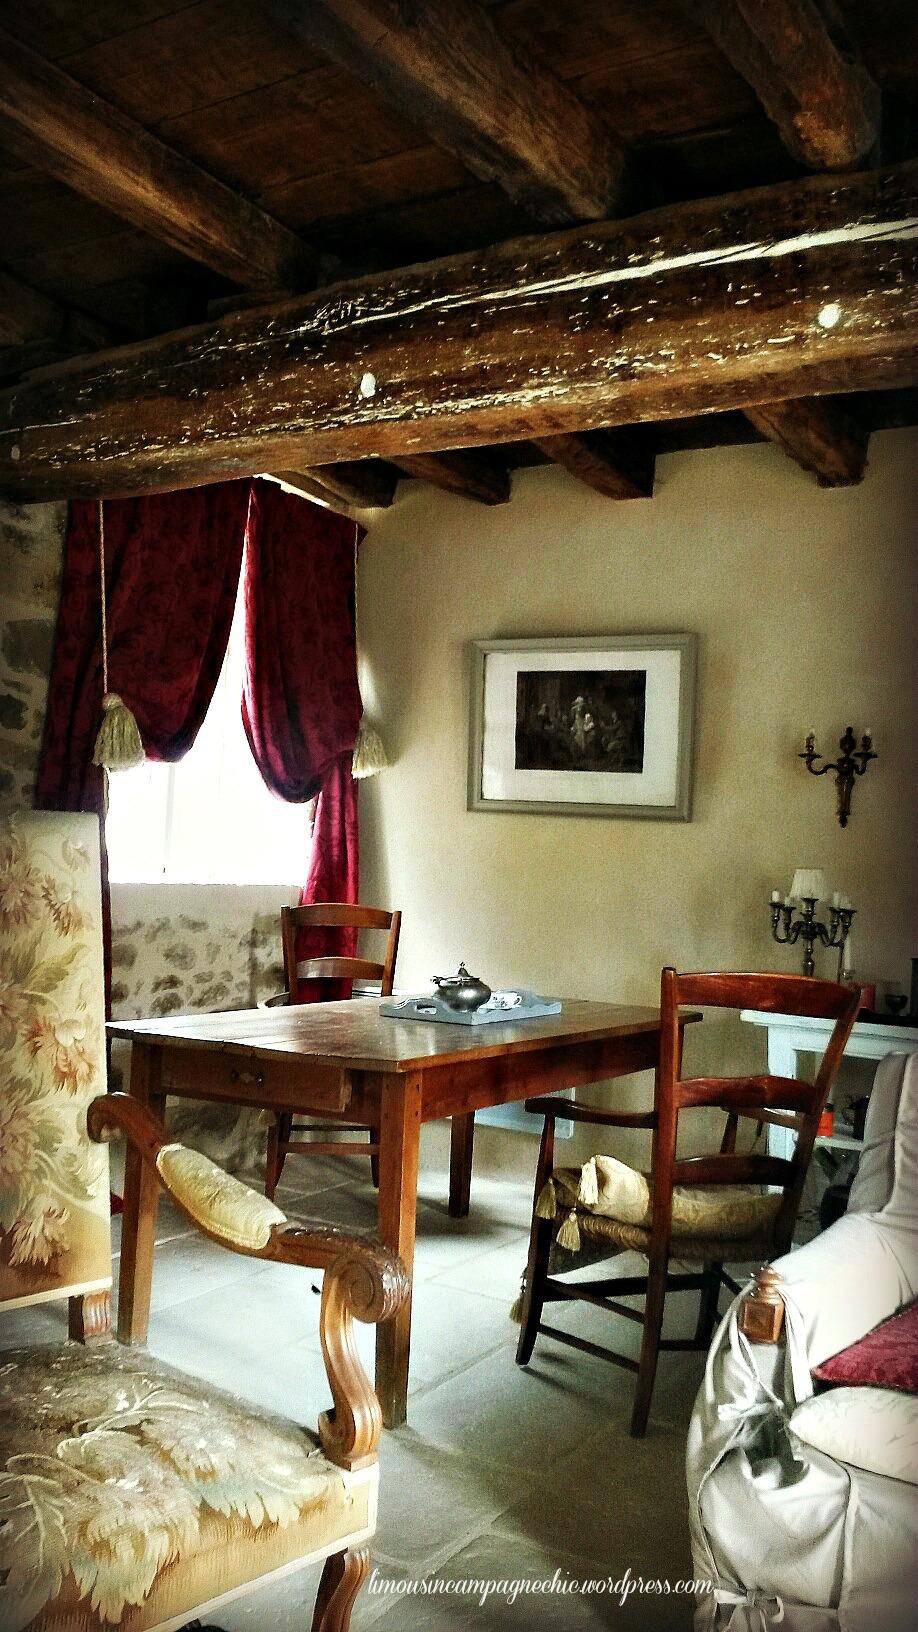 Le coin salle à manger - The eating corner